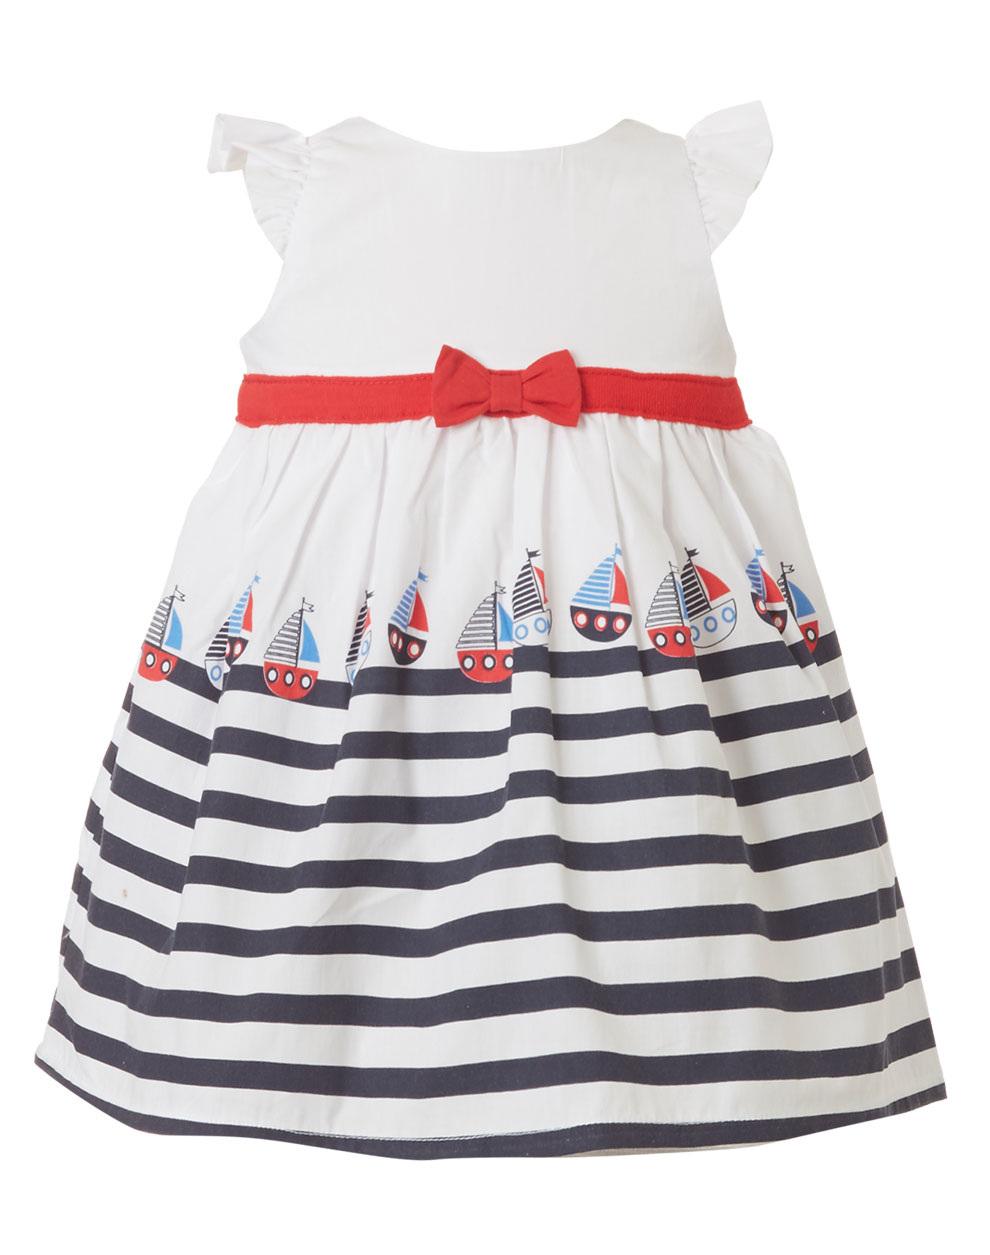 a9c5486c517 Φόρεμα με ριγέ λεπτομέρειες και διακοσμητικό φιόγκο στη μέση - σταθερό  ύφασμα ποπλίνα